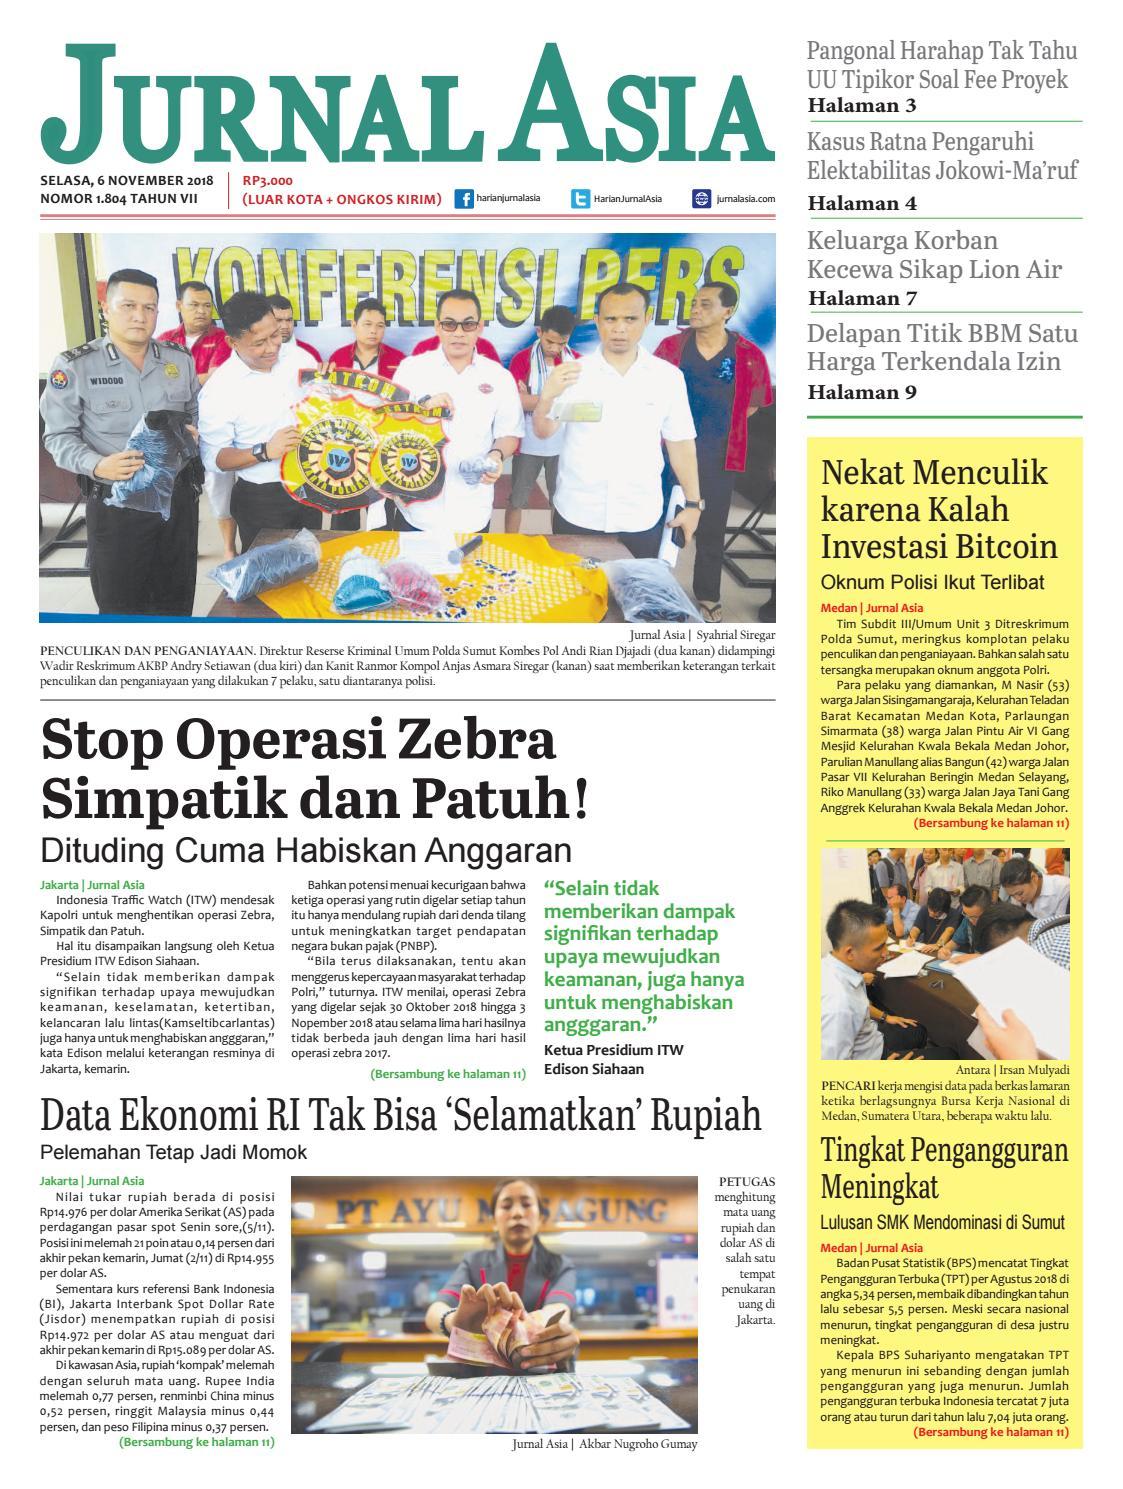 Harian Jurnal Asia Edisi Selasa 6 November 2018 By Harian Jurnal